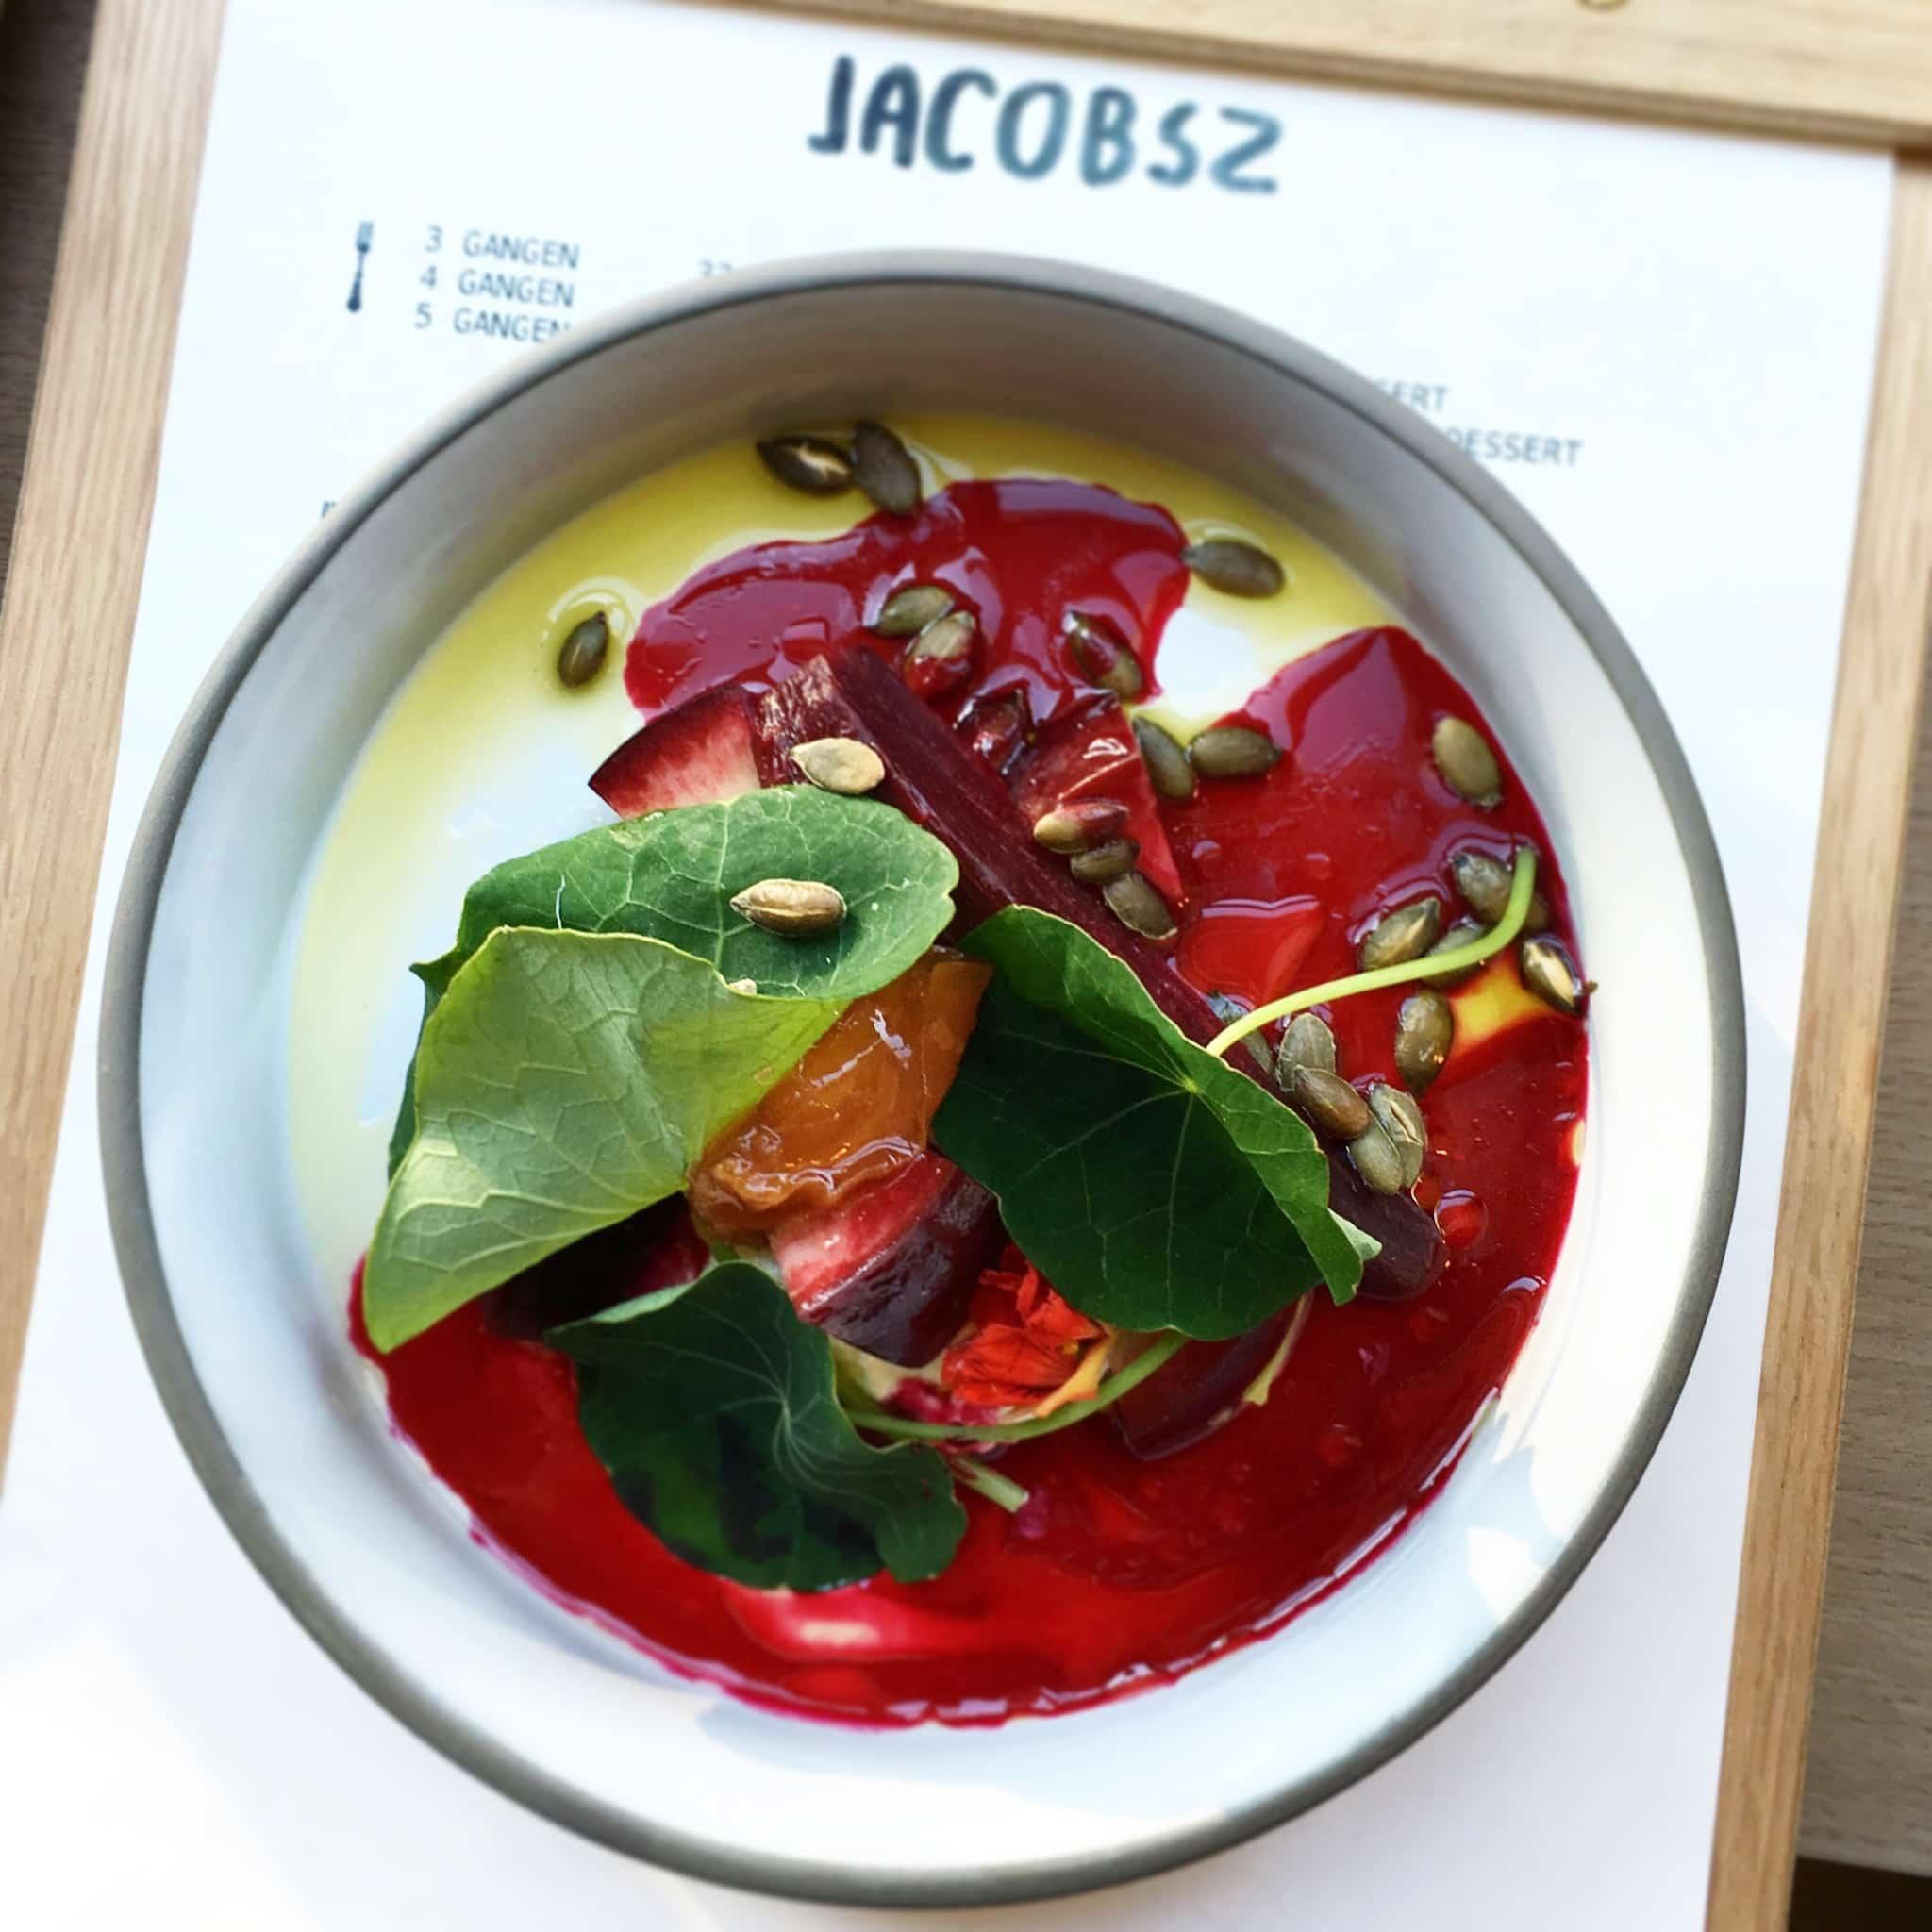 image2 - Restaurant Jacobsz Amsterdam - 020 tip